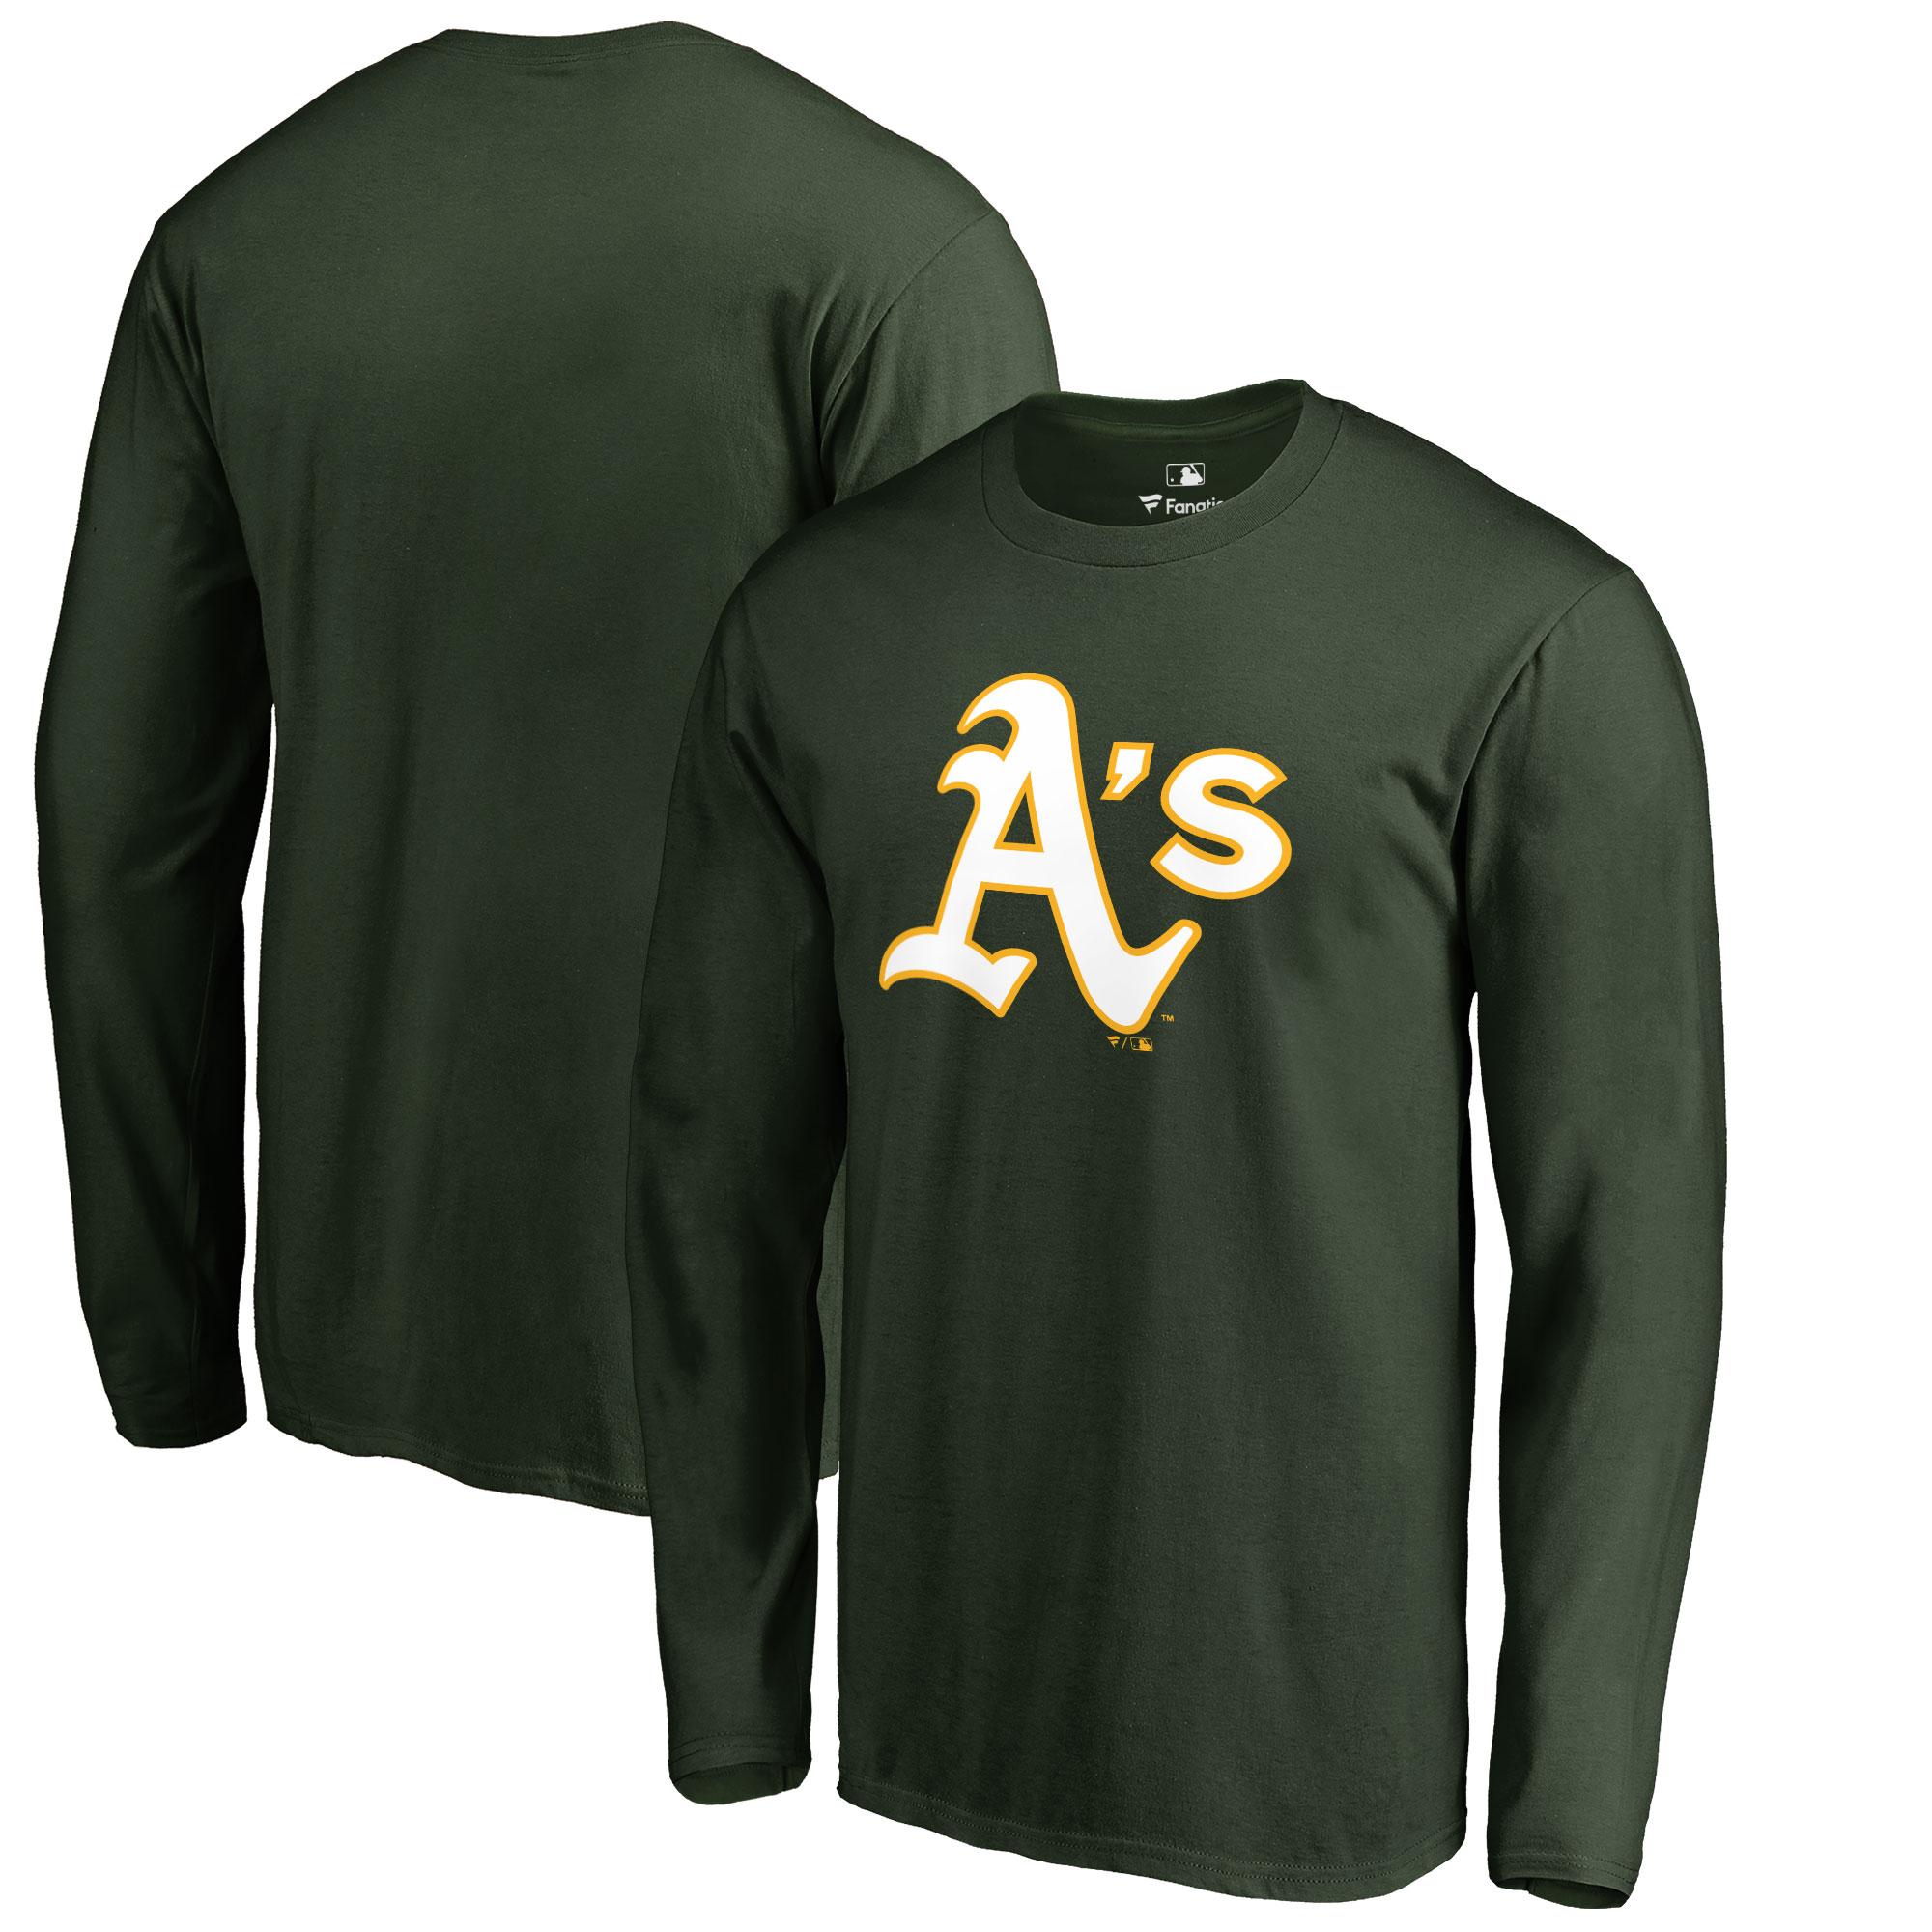 Oakland Athletics Big & Tall Primary Team Logo Long Sleeve T-Shirt - Green